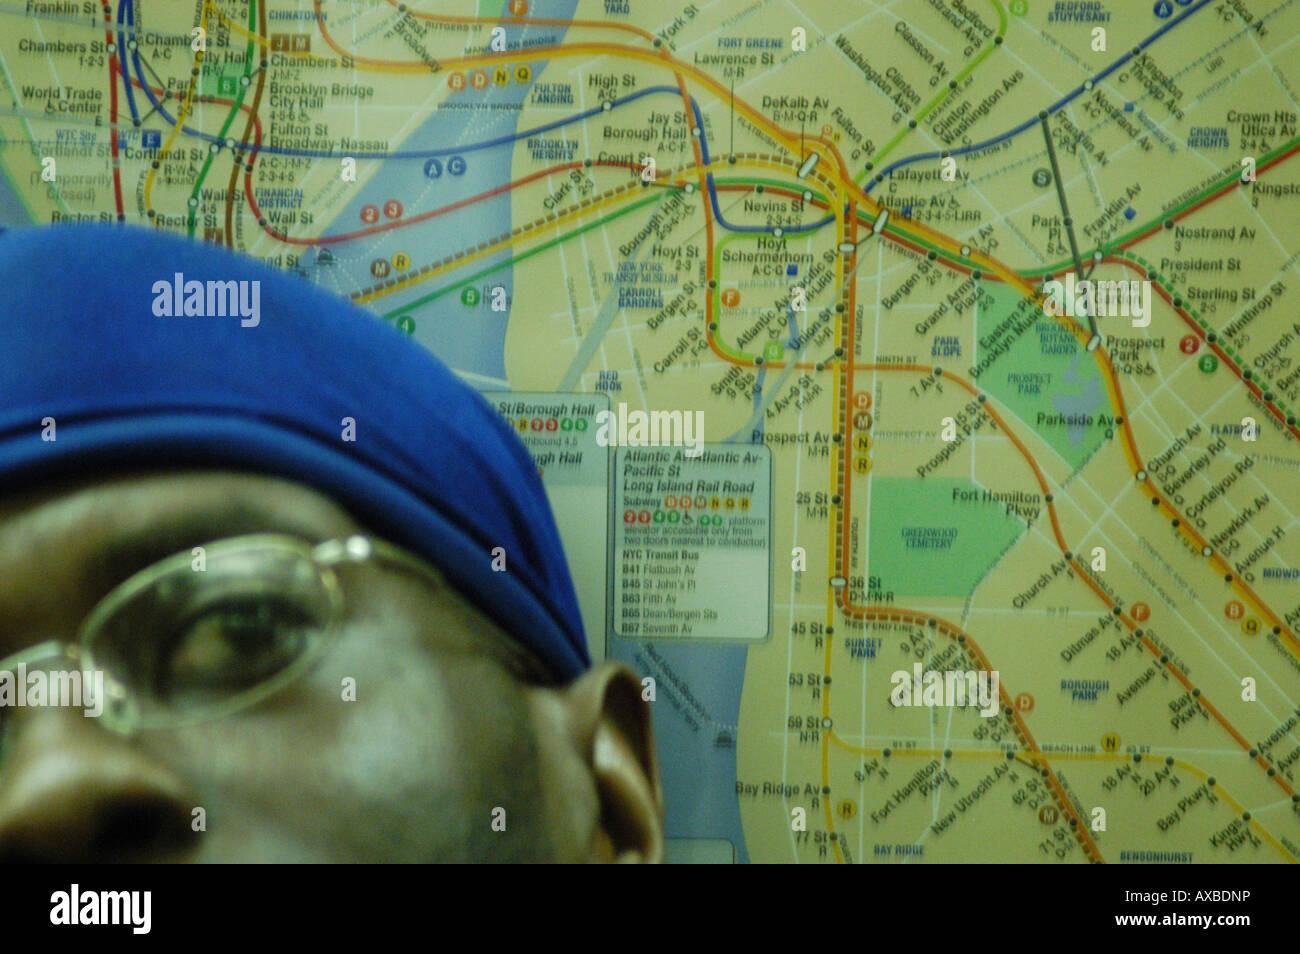 New York Underground Map Stock Photos & New York Underground Map ...